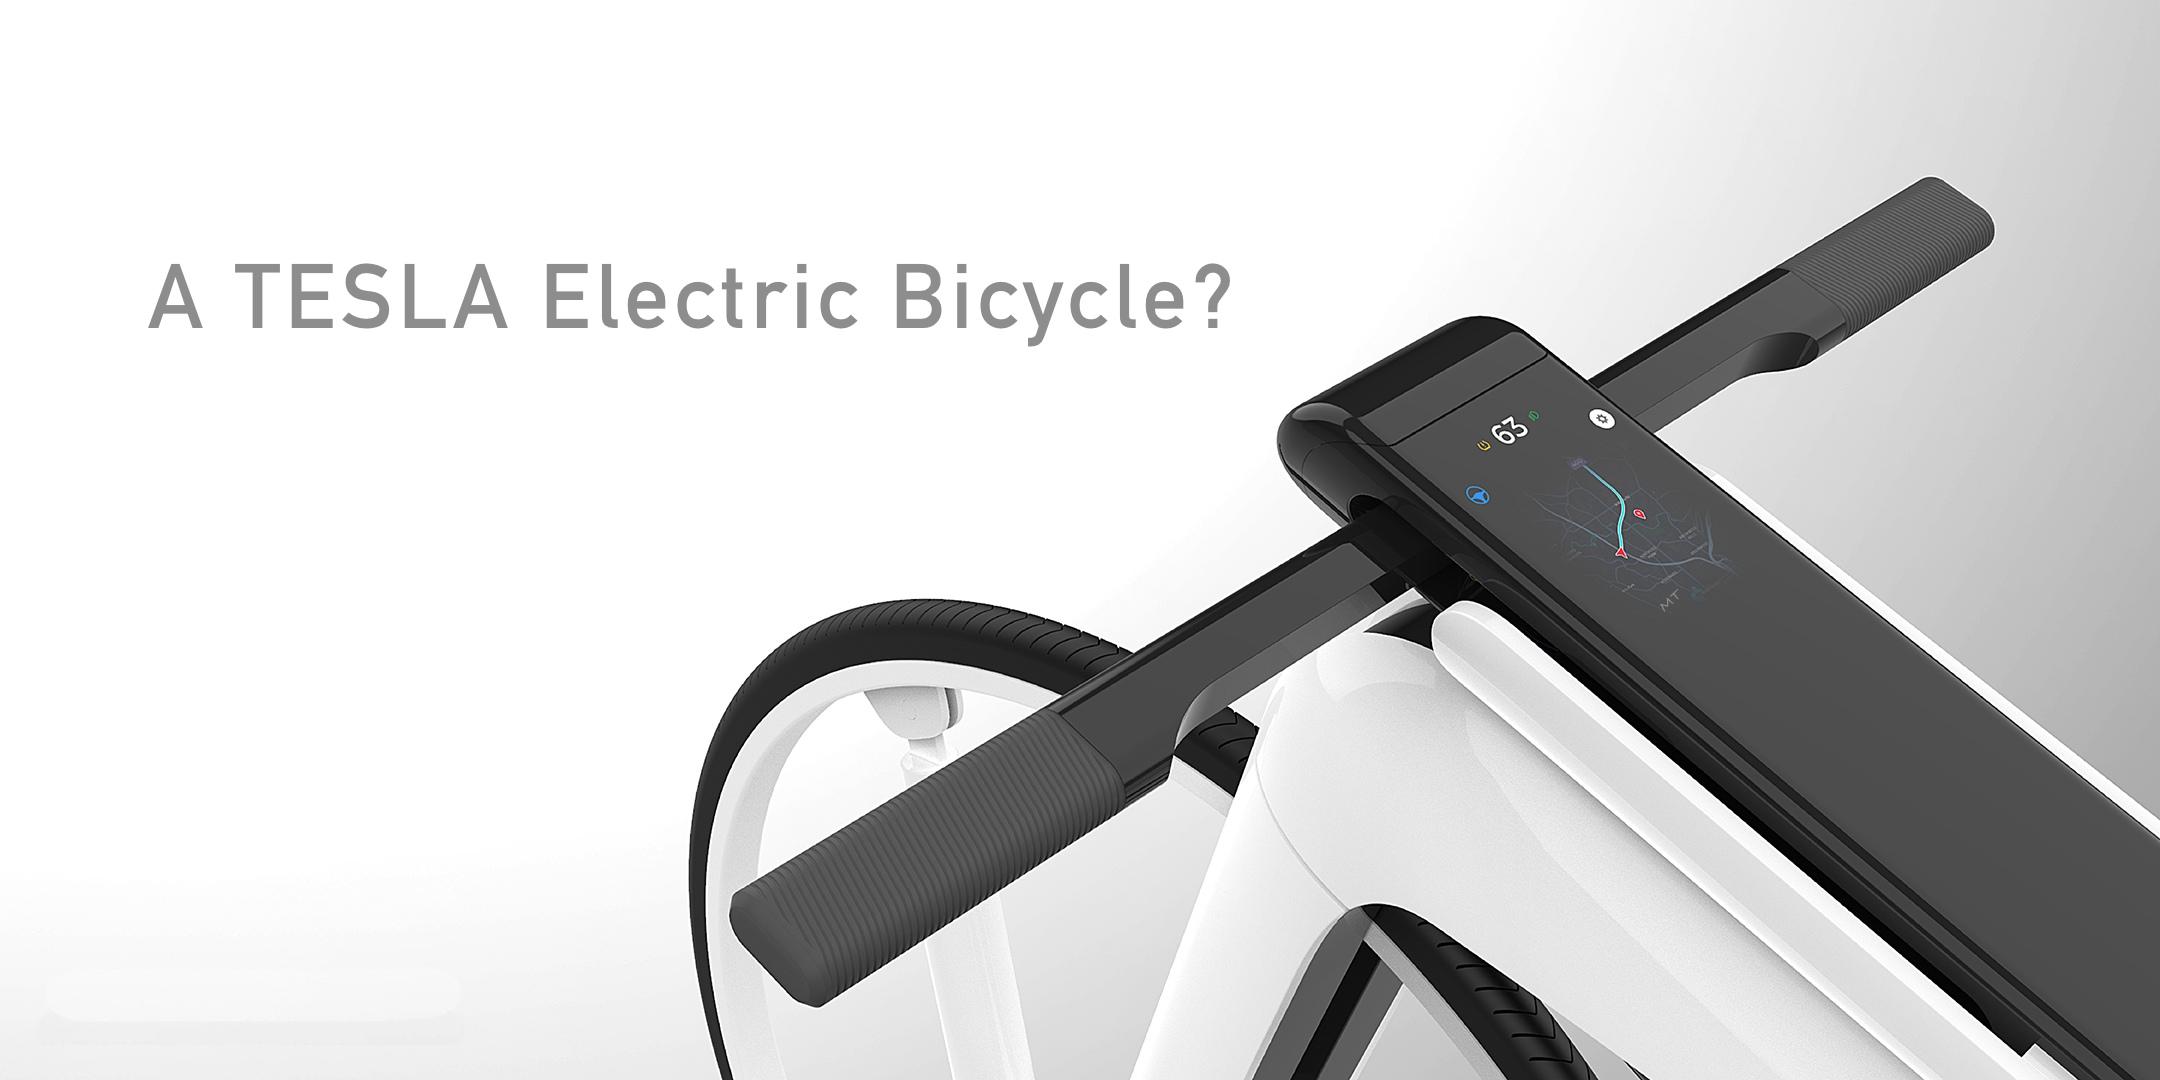 Elon Musk says Tesla 'might do an electric bike'